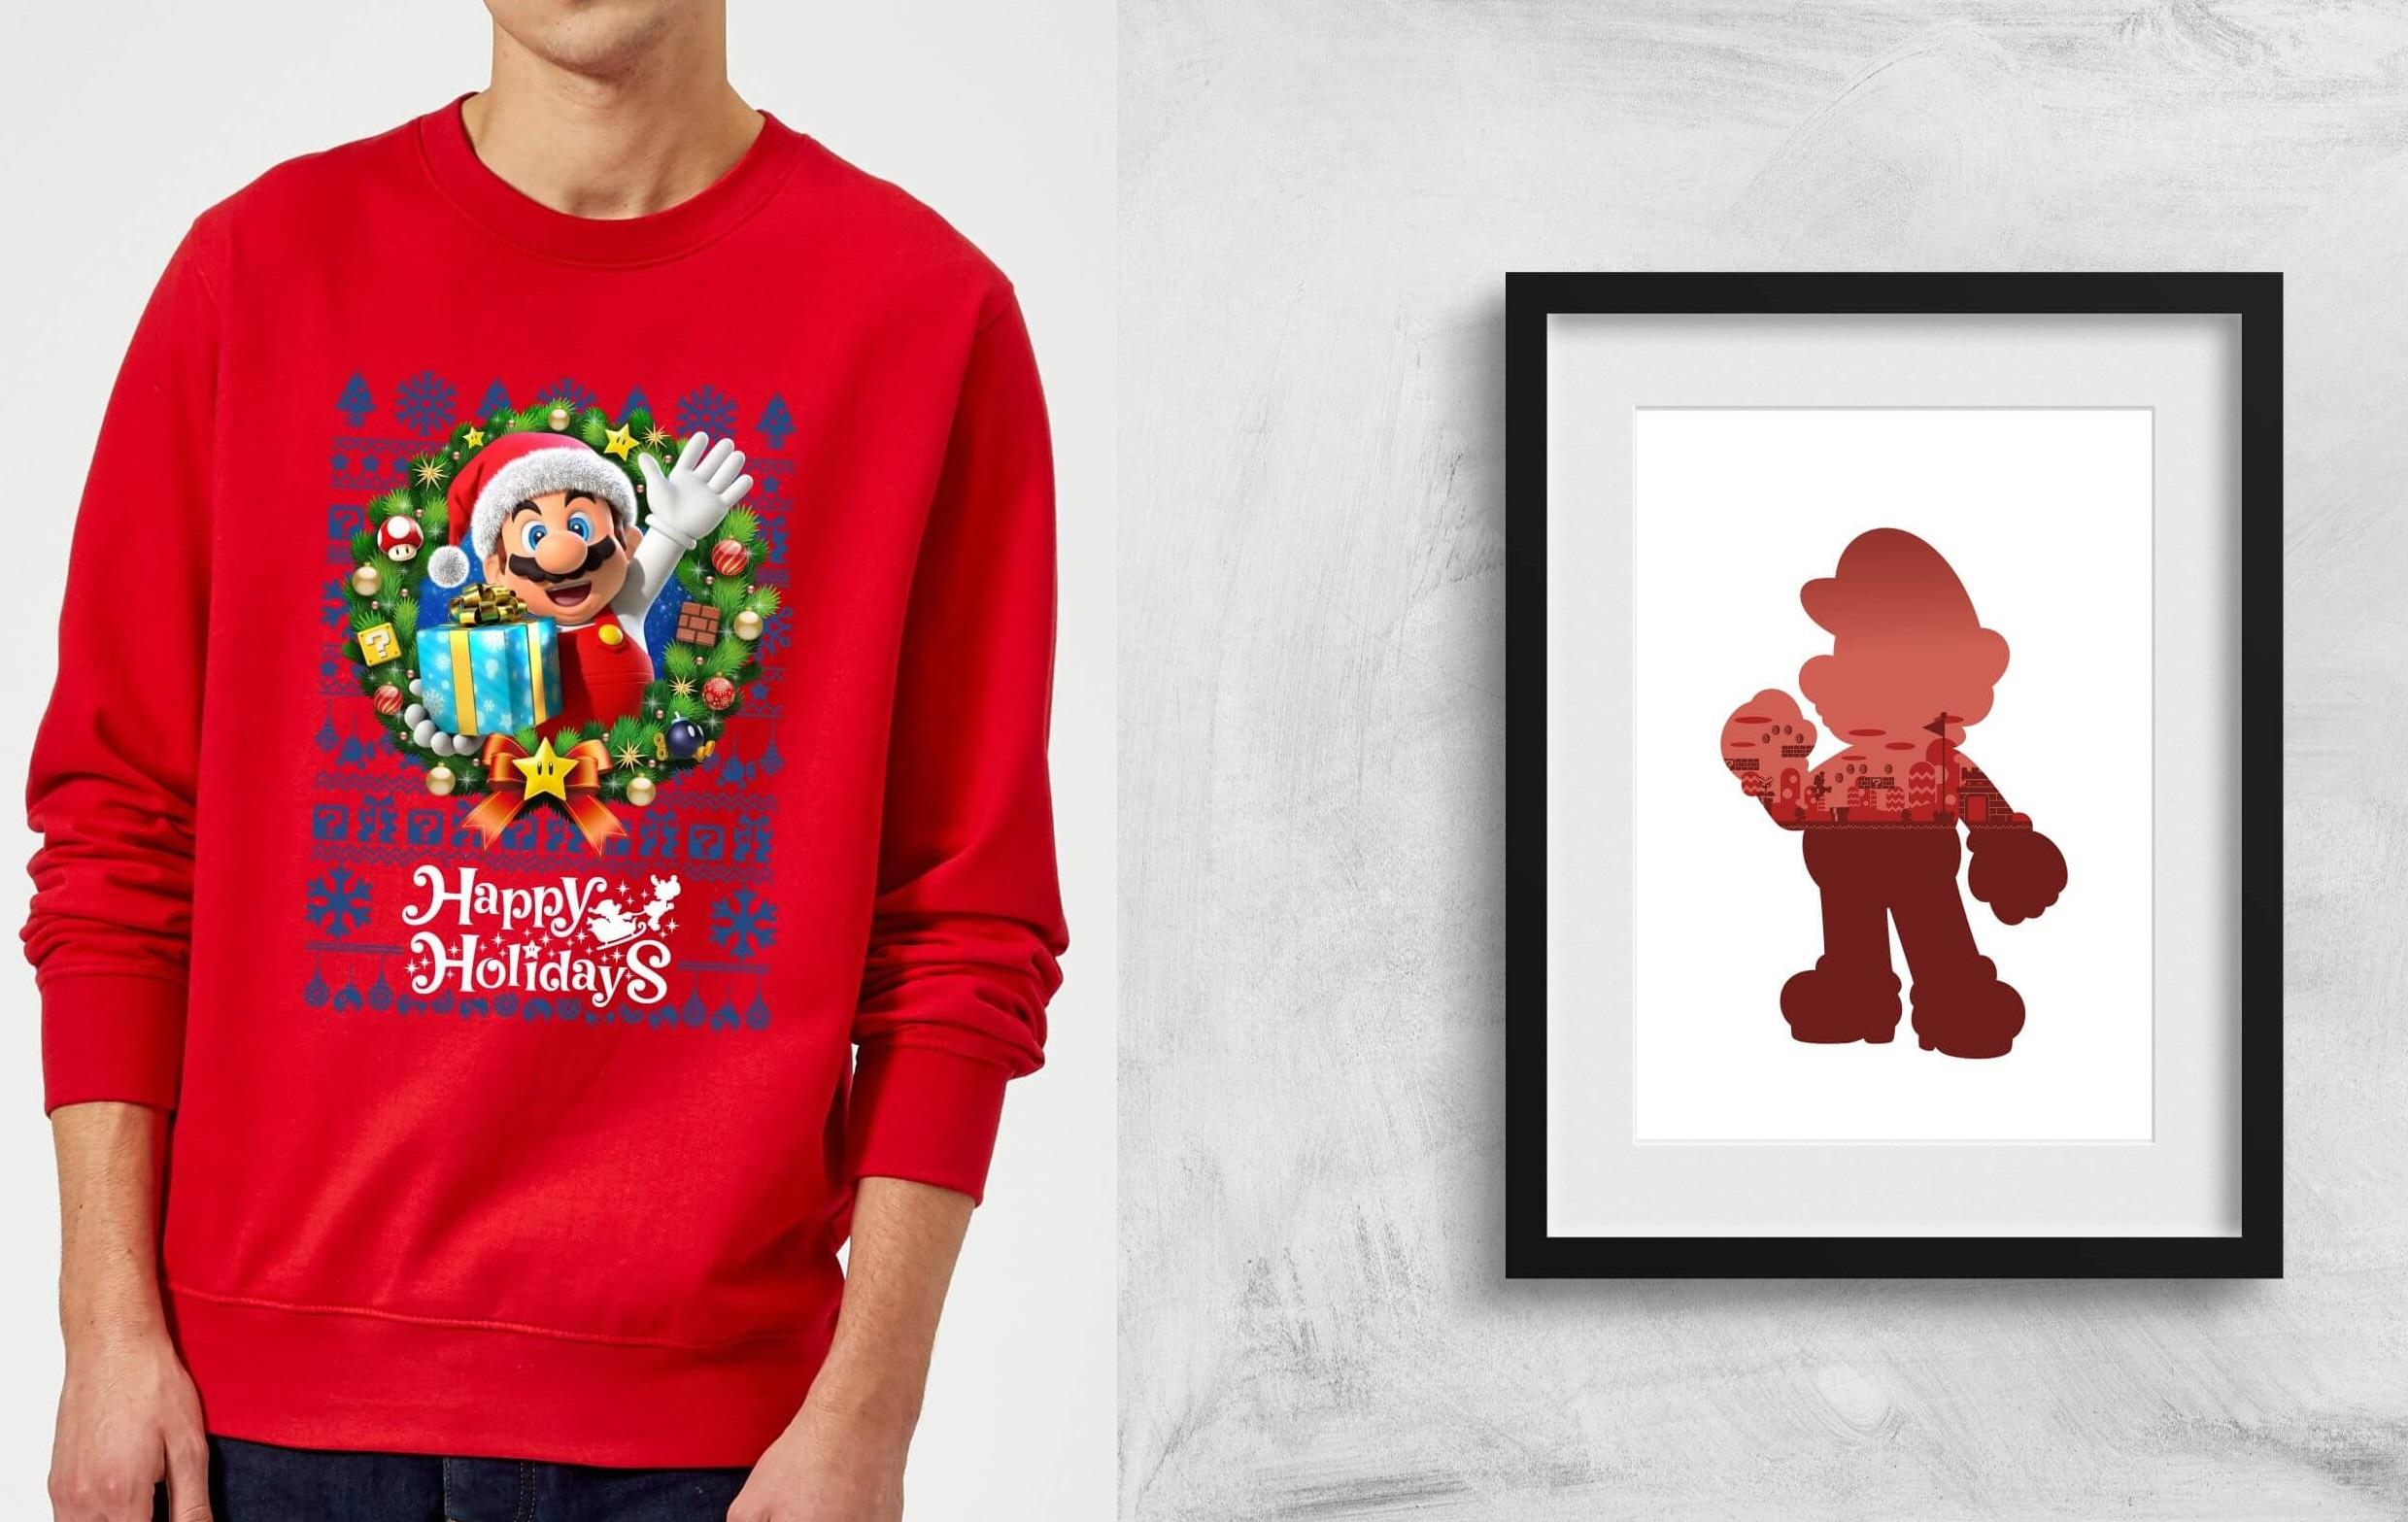 Sélection de Pulls de Noël Nintendo + poster Nintendo offert et livraison gratuite - Ex : Pull Mario Happy Holidays + Poster Super Mario